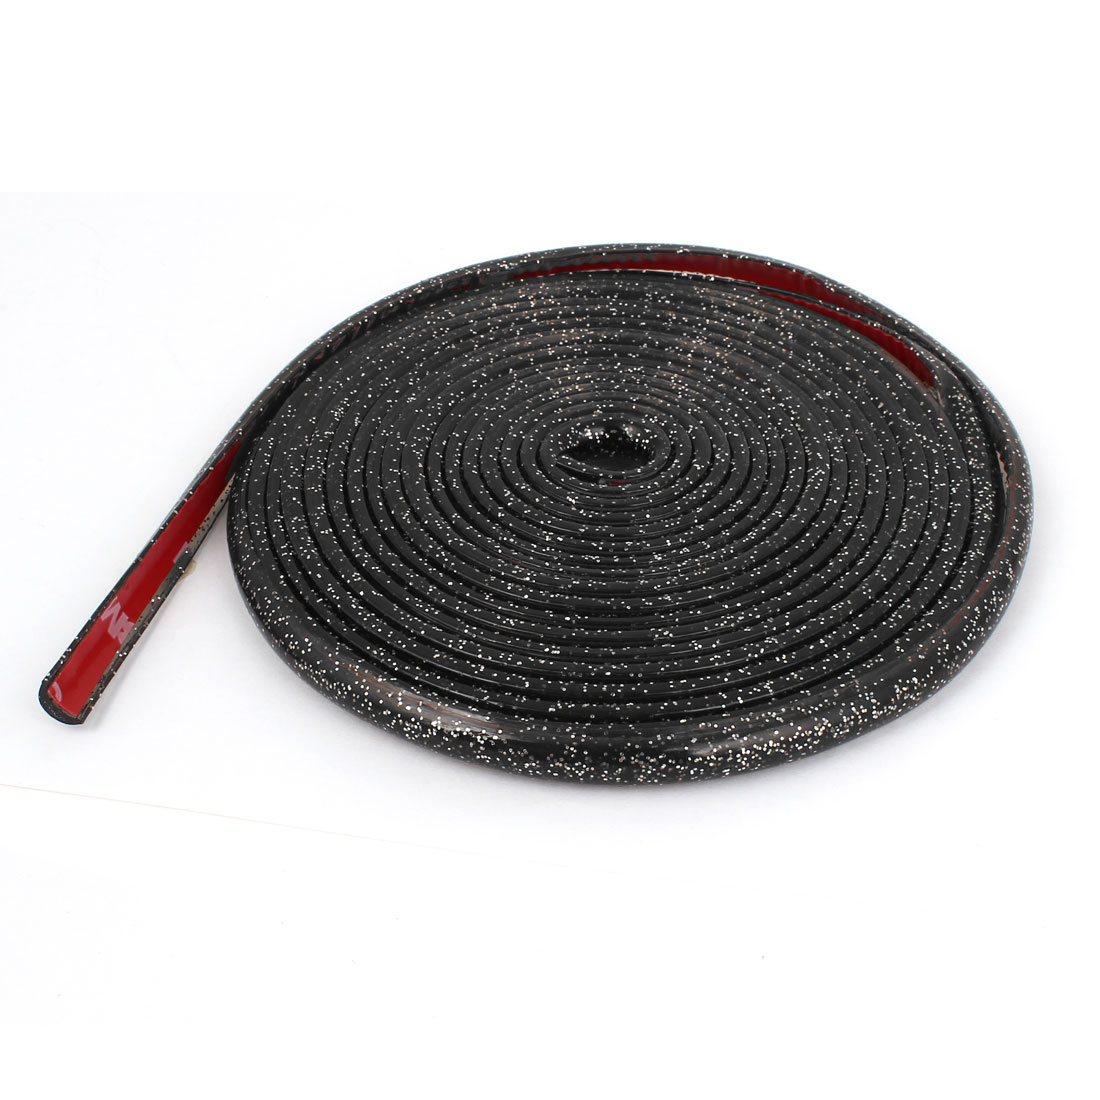 4 Meters Length Glitter Black Soft Plastic Flexible Strip Sticker for Car